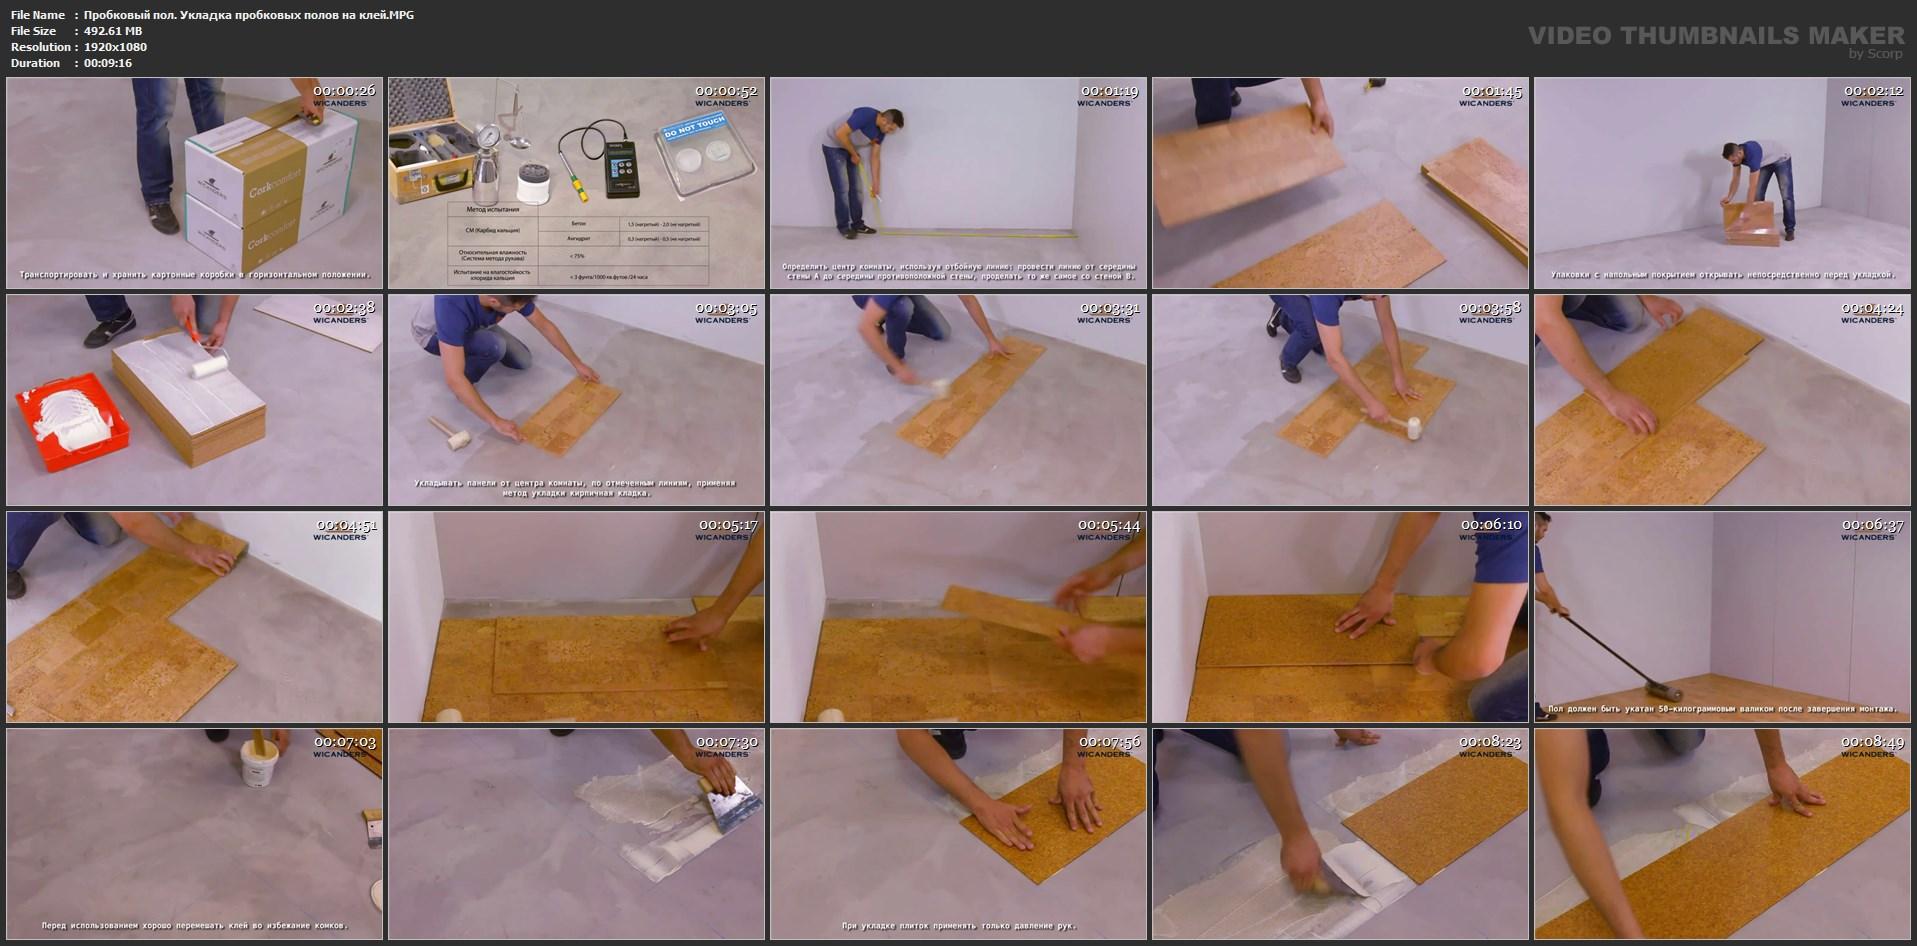 Укладка ламината своими руками - 105 фото и видео как производится укладка ламината